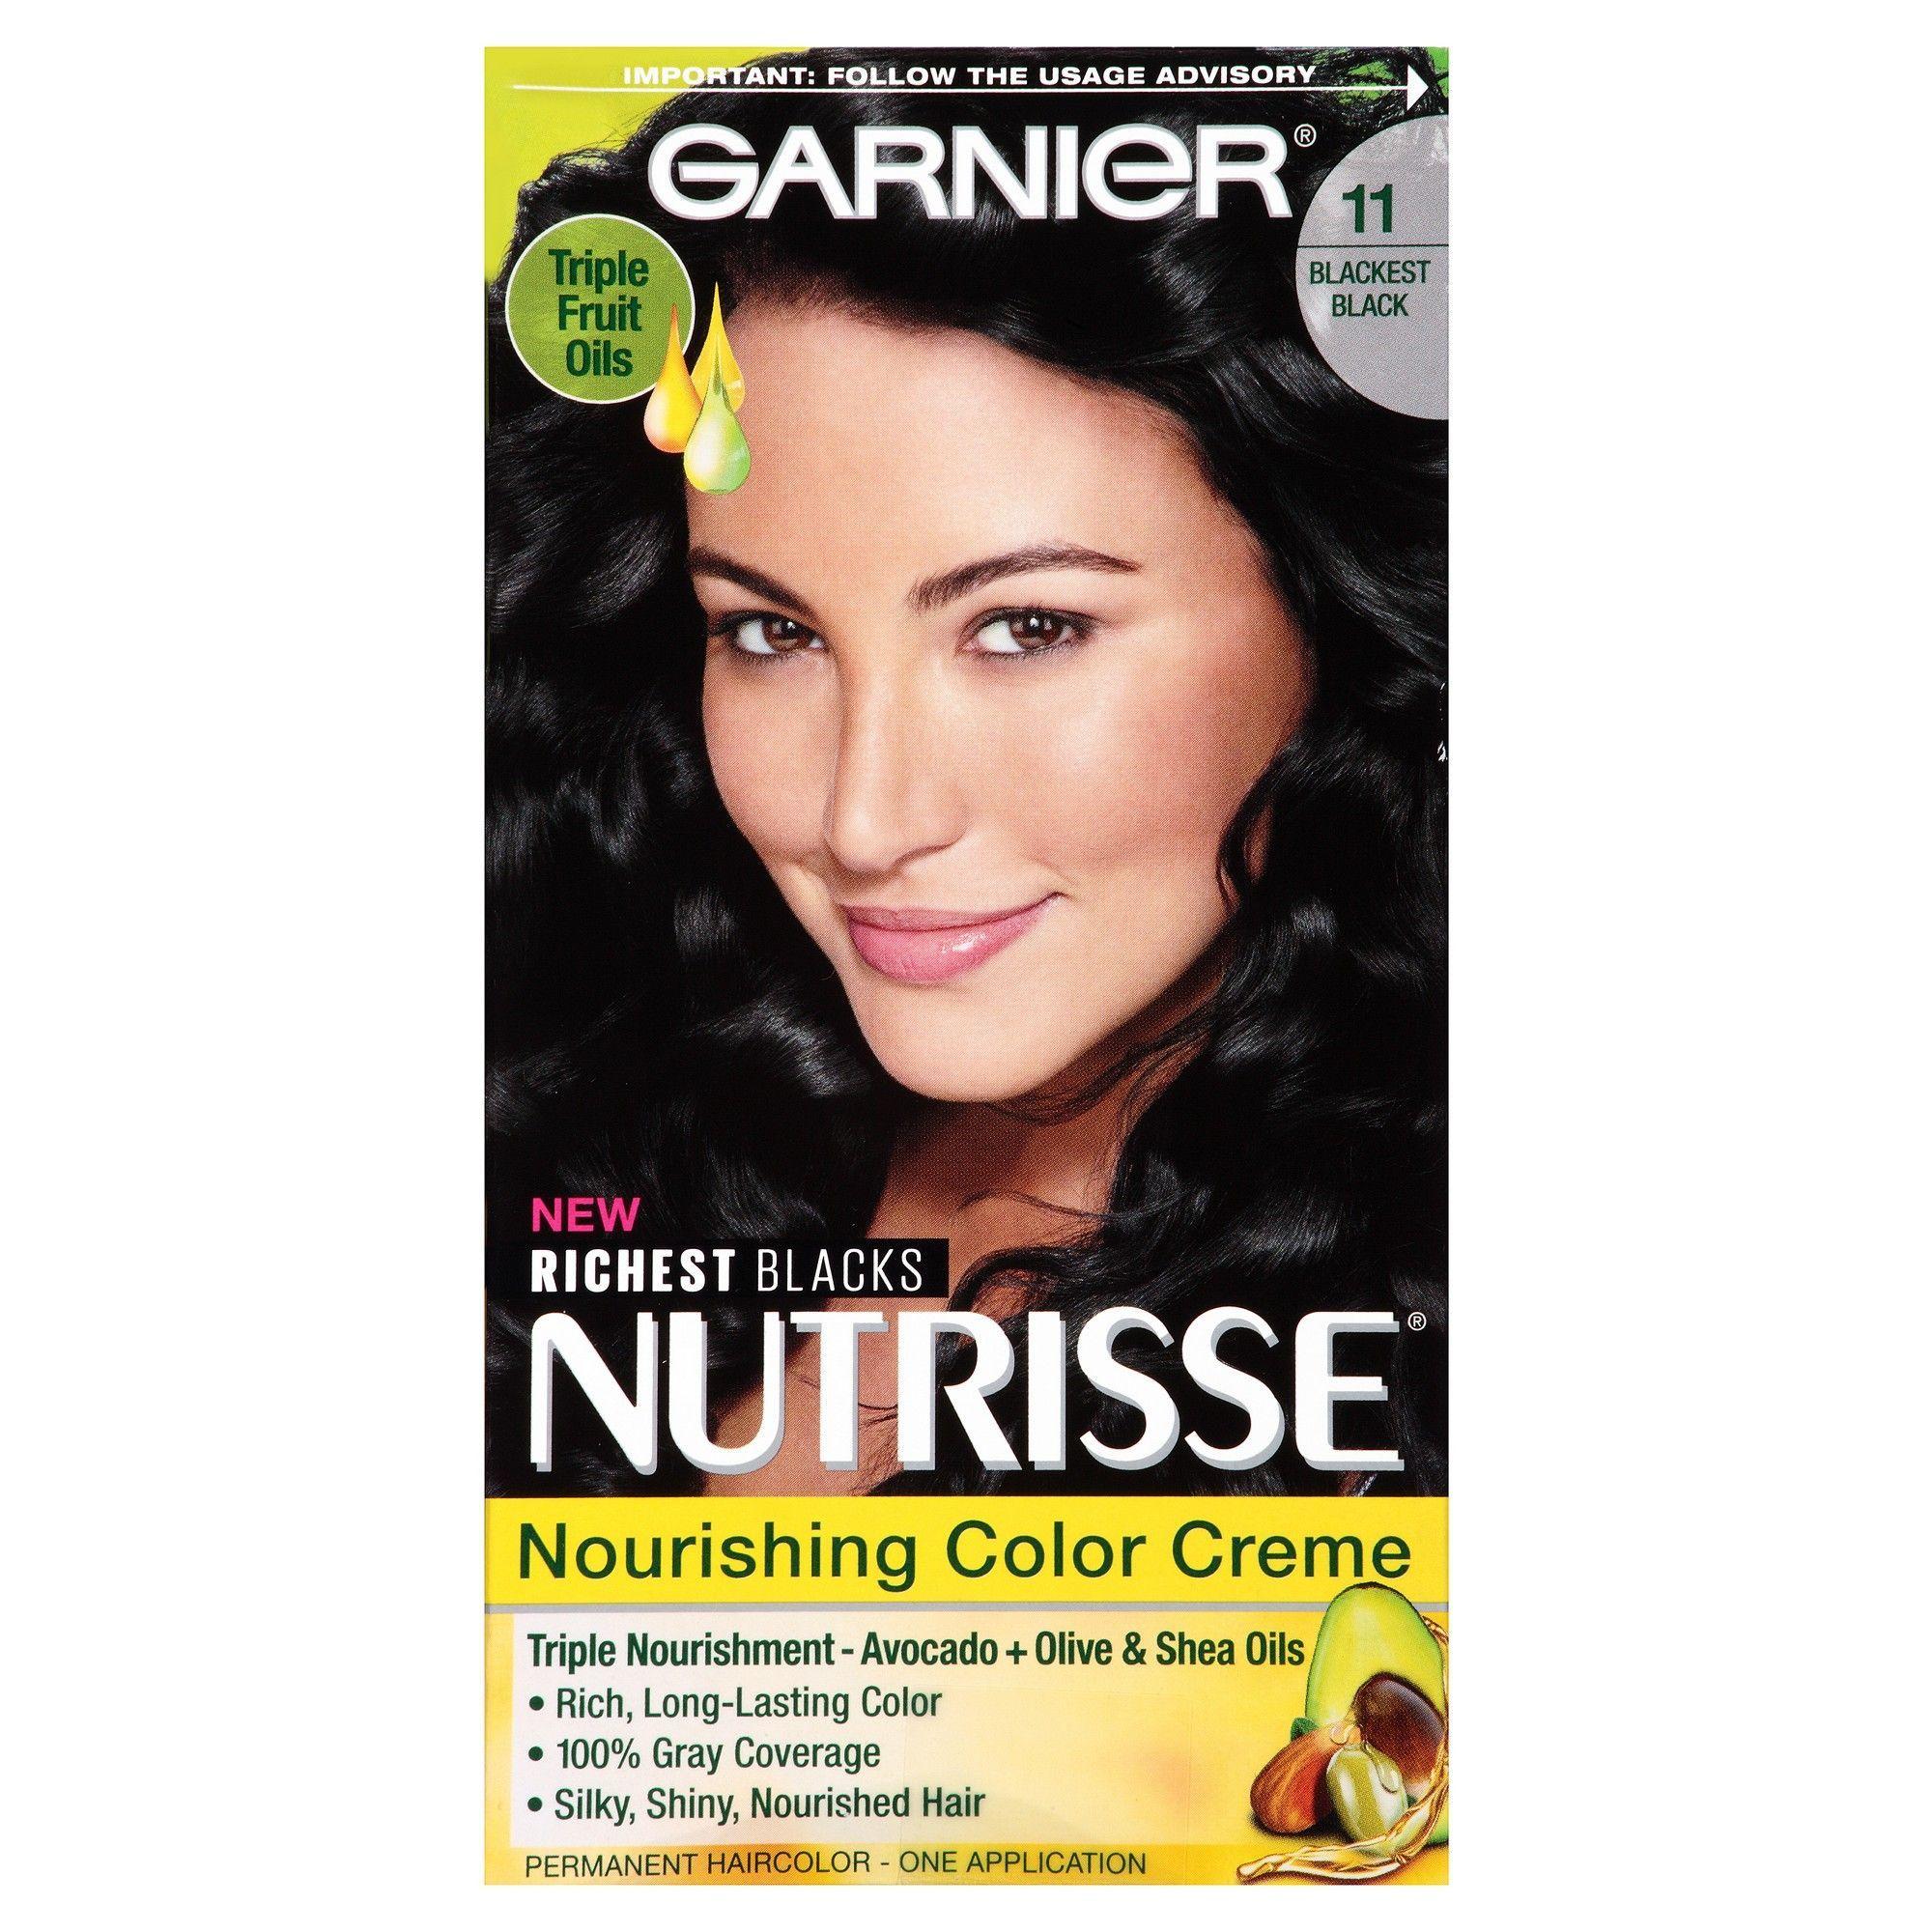 backgrounds blackest black hair dye of smartphone hd pics garnier nutrisse nourishing color creme products